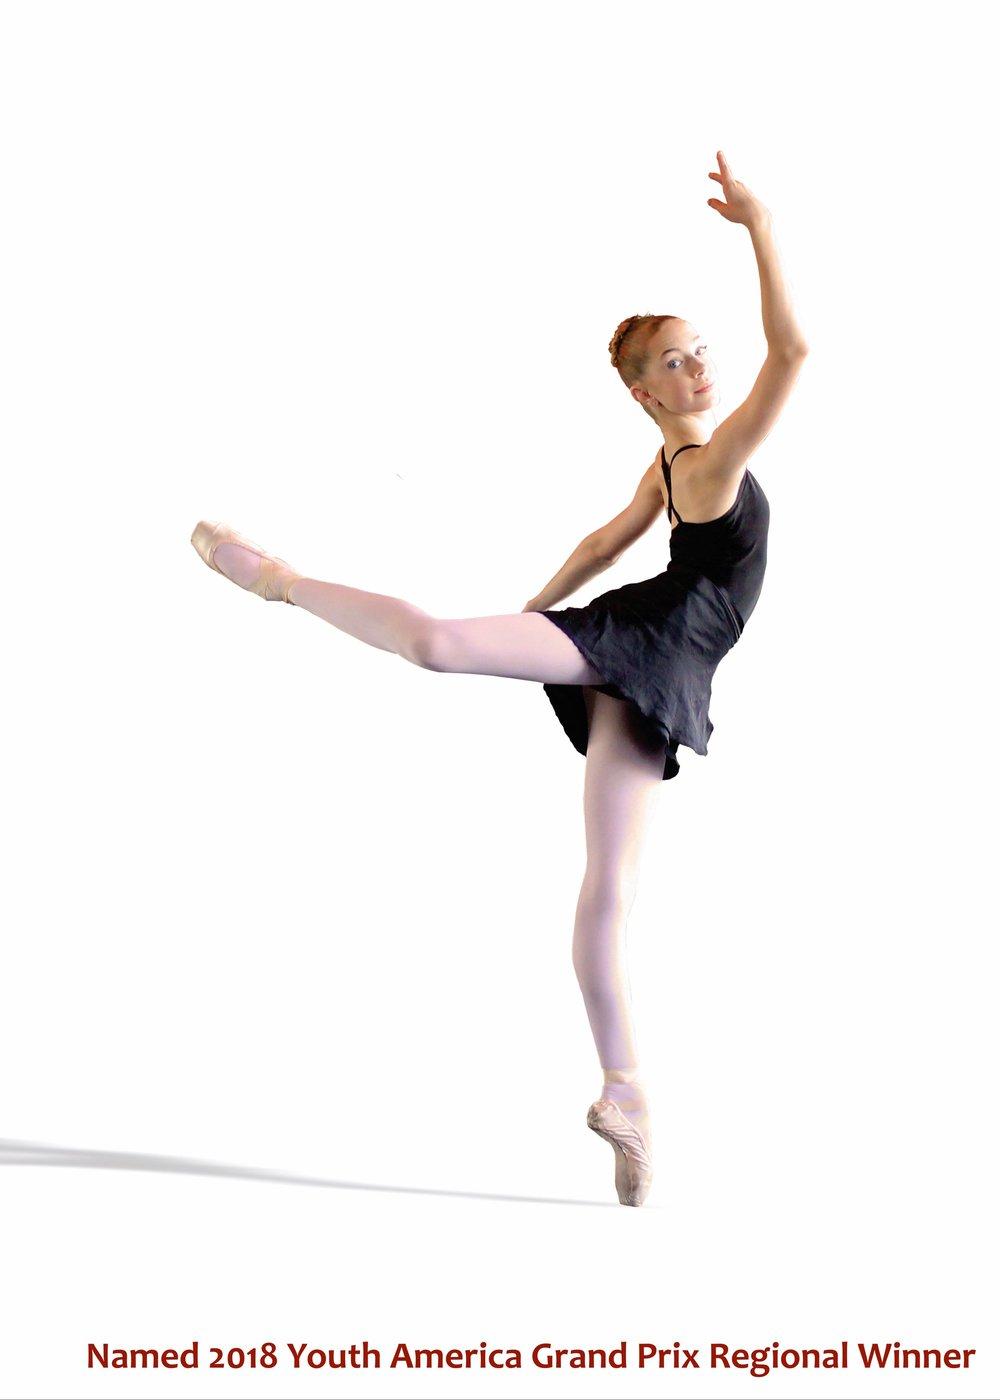 YAGP Regional Winner 2018. Pre-professional dance training in San Antonio.